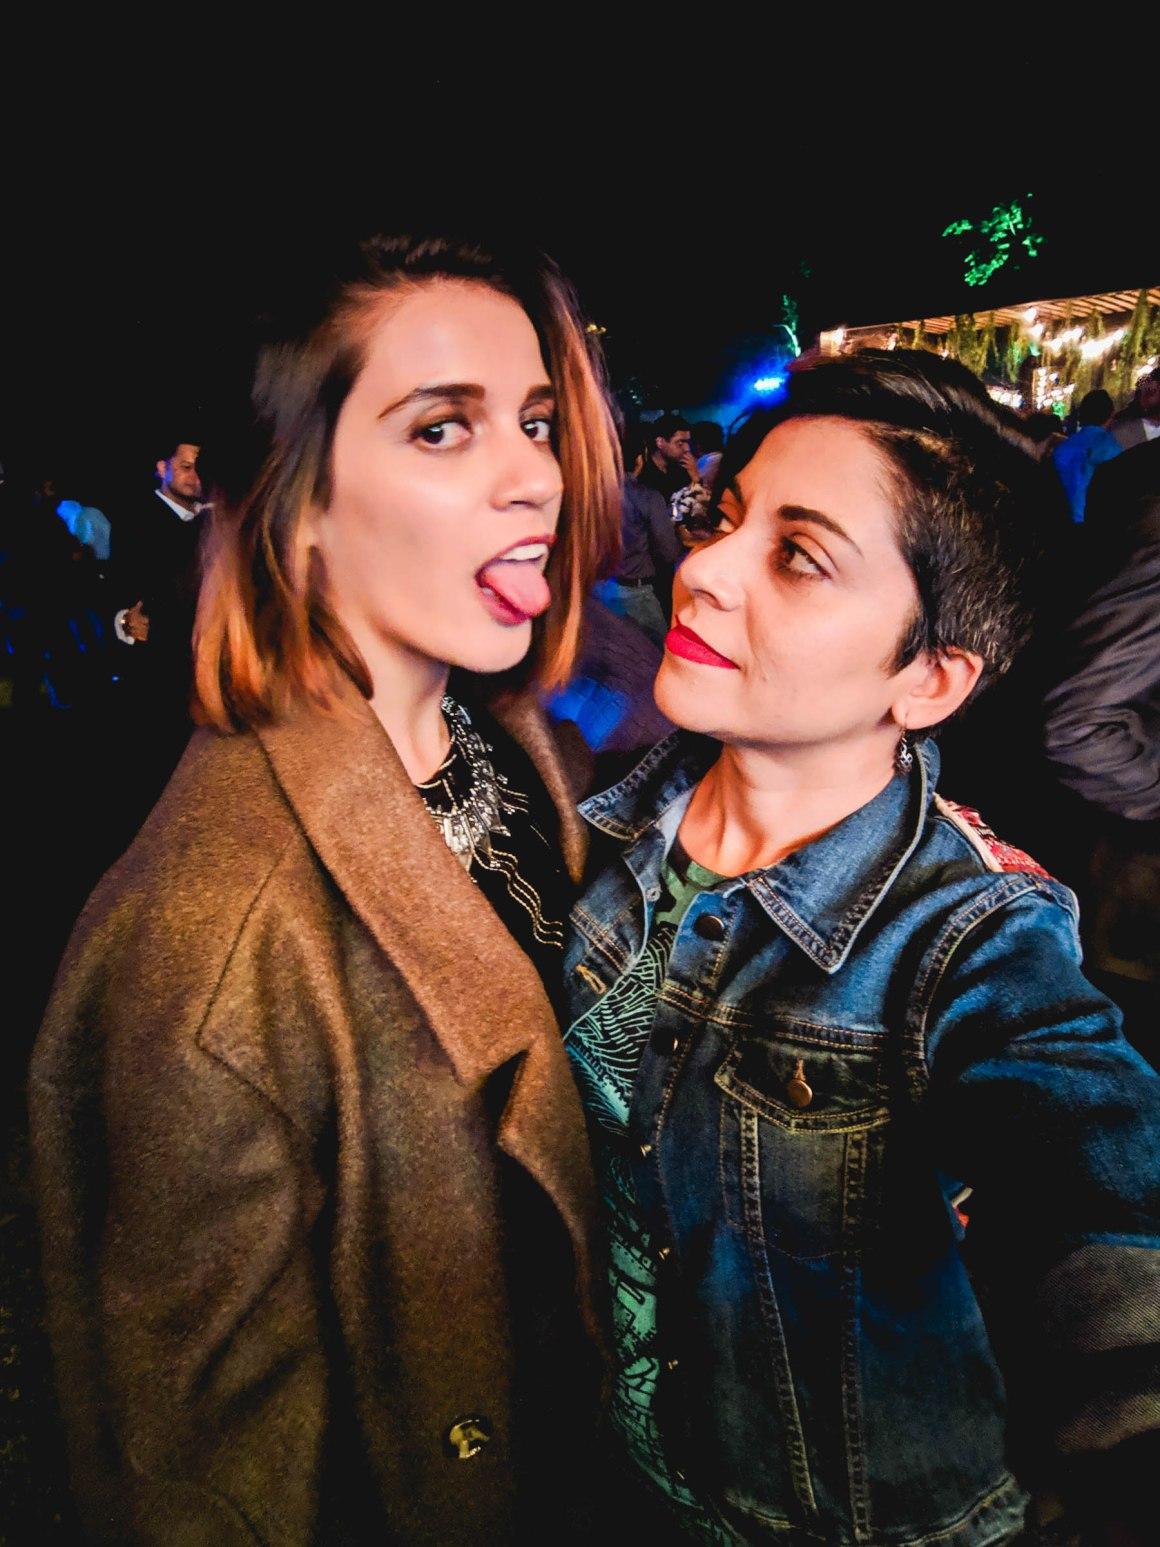 Naina.co, Naina Redhu, Pixel 3 XL, Google Pixel, Pixel 3, Camera, Smartphone Photography, Google Smartphone, Magazine Cover, #NAINAxSTYLE, Photo shoot, Photography, Bad Gal Bang, Benefit Cosmetics, Benefit India, PoshPride, EyesForTechnology, EyesForBeauty, Mascara, Selfie, Night Sight, Portrait Mode, Wide Selfie, Google Pixel 3 Launch Party, Portraiture, Photographer, Photo Blogger, Photo Blogger India, Photographer India, Professional Photographer India, Lifestyle Photographer, Lifestyle Blogger